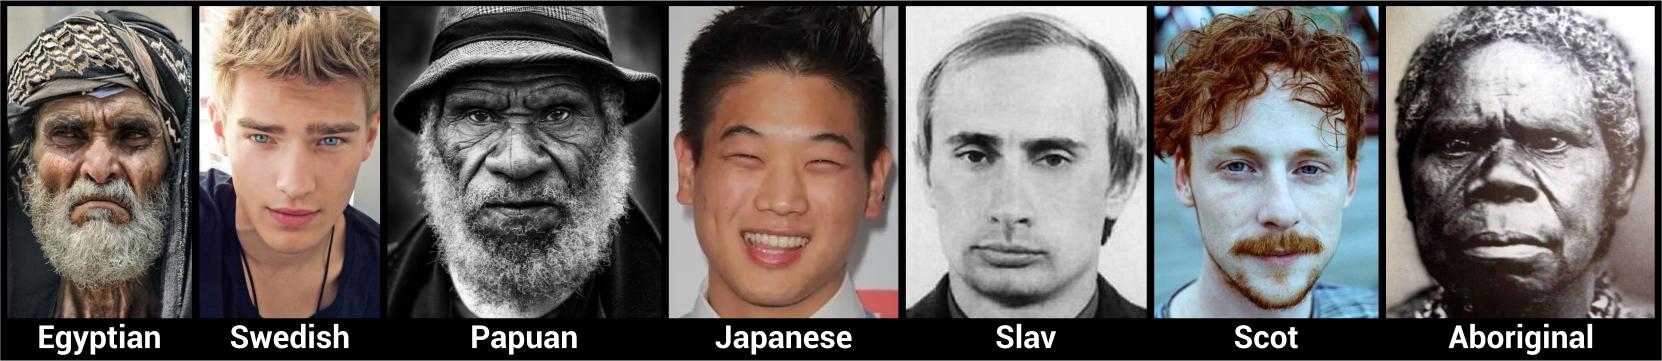 Different Races